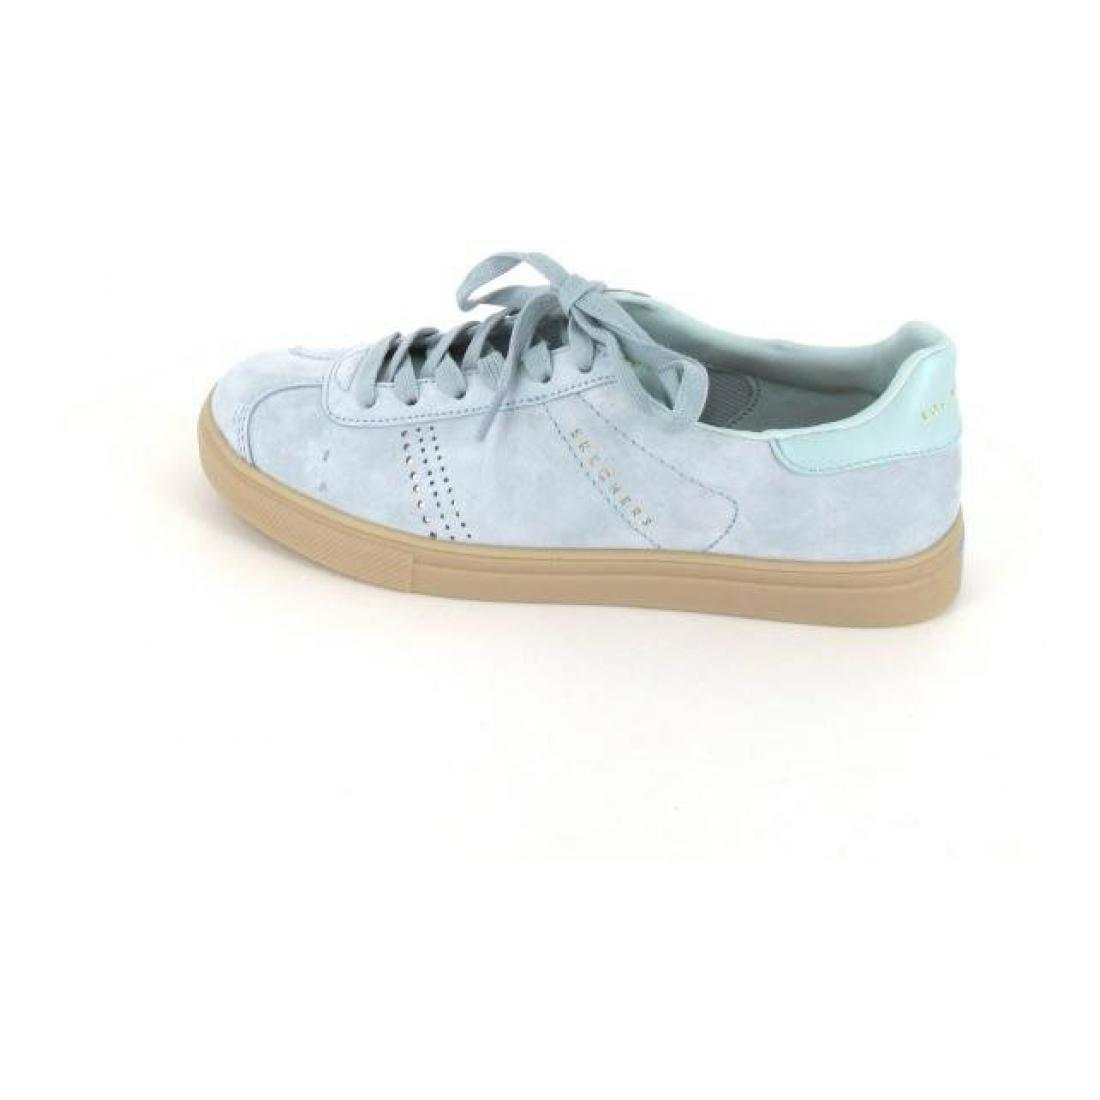 Skechers Sneaker Moda Lazy Sundays   Schuh Welt Wo